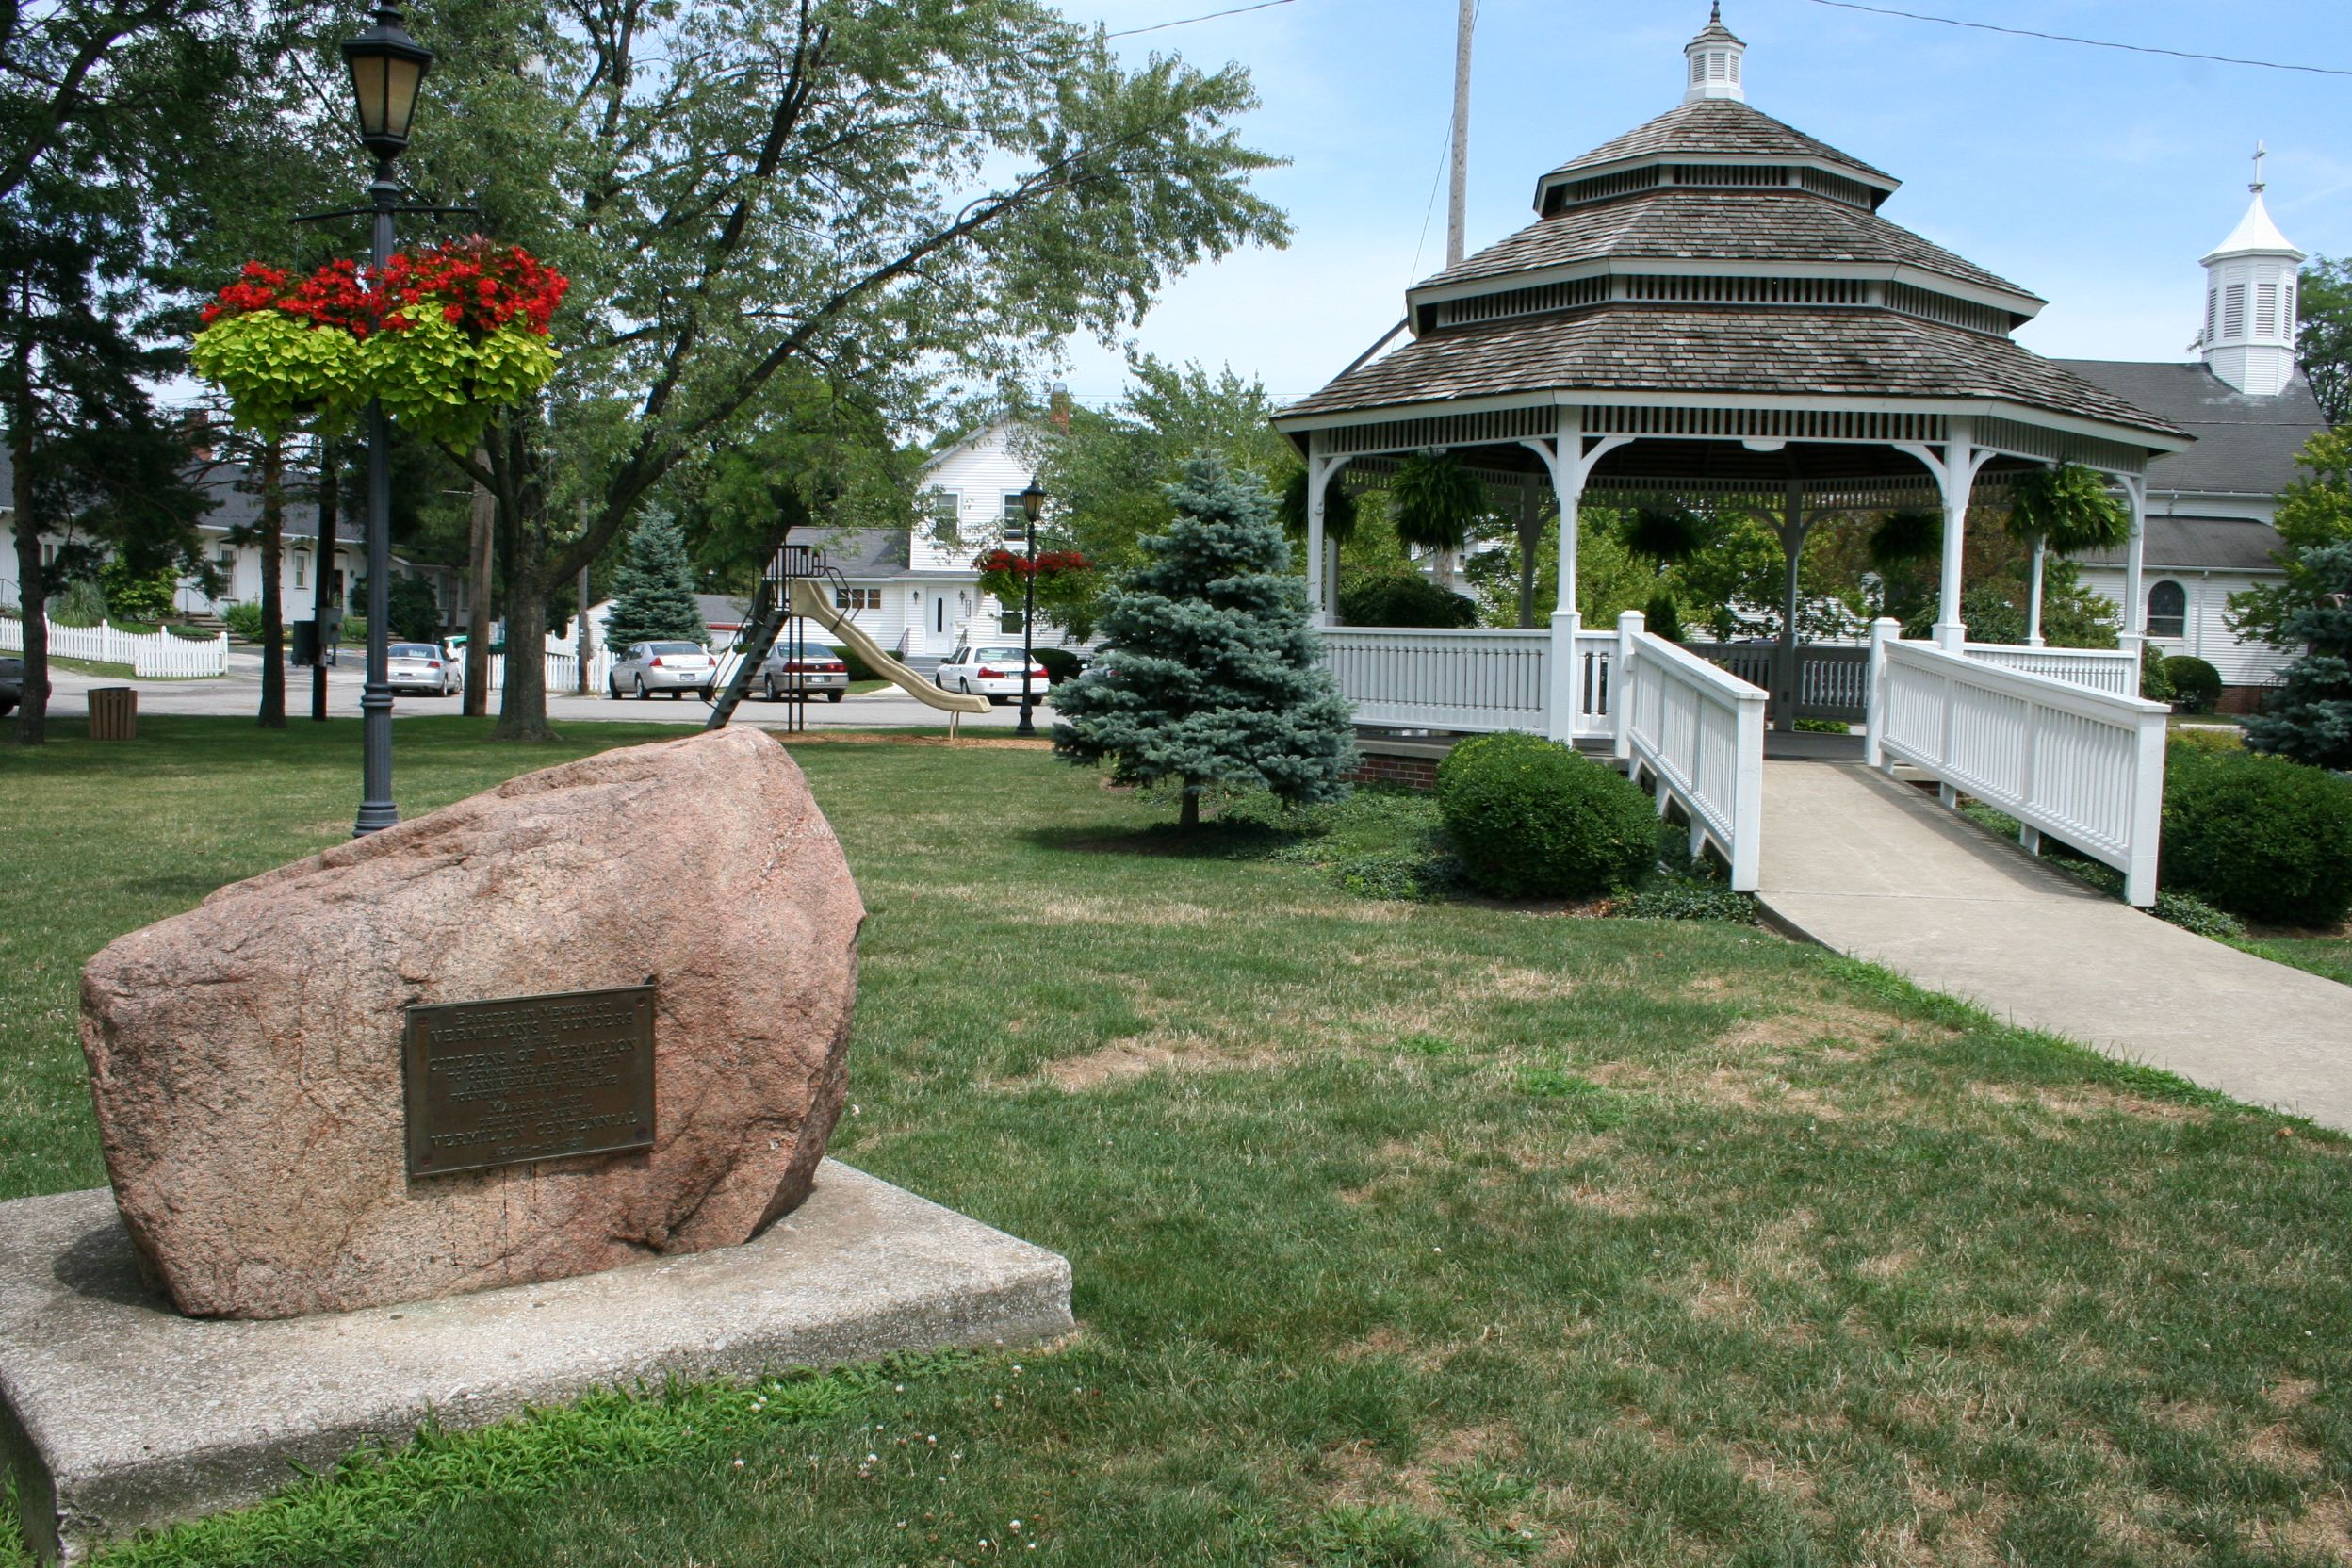 Ohio erie county vermilion - Victory Park Gazebo Vermilion Ohio